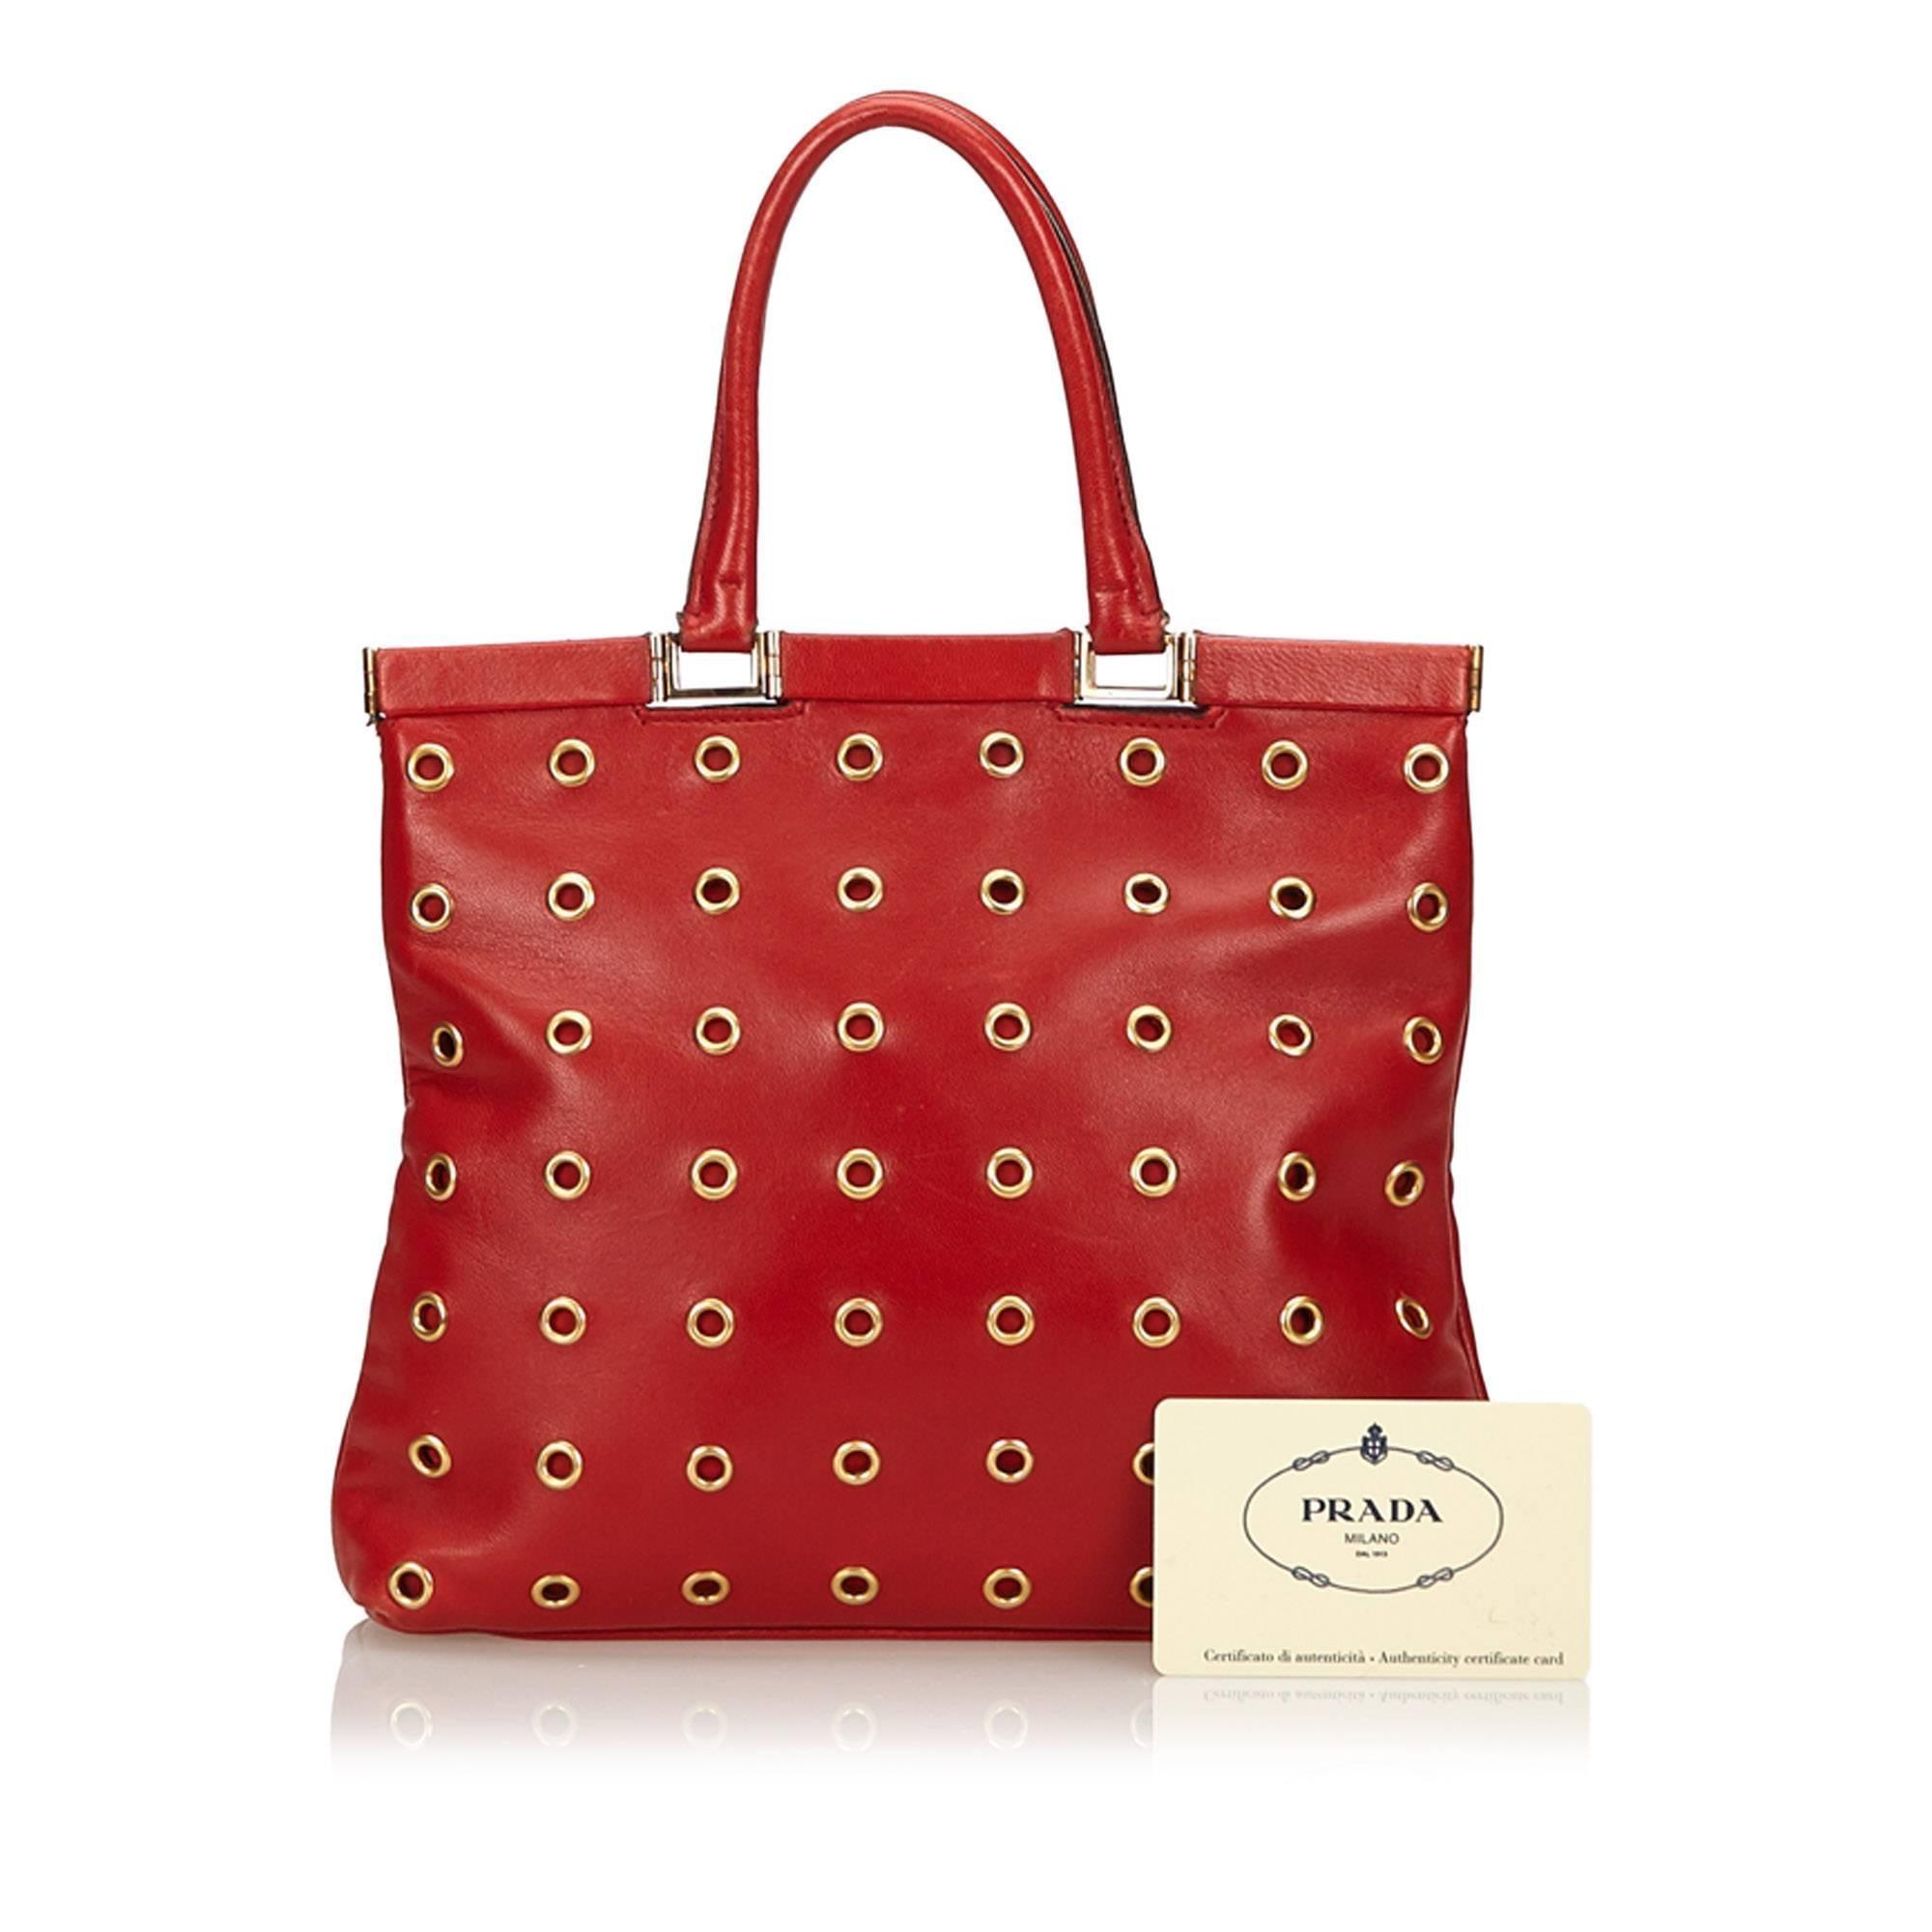 2fe7820cca2a ... netherlands prada red calf leather 18 carat gold toned eyelet handbag  for sale 5 2f317 0be23